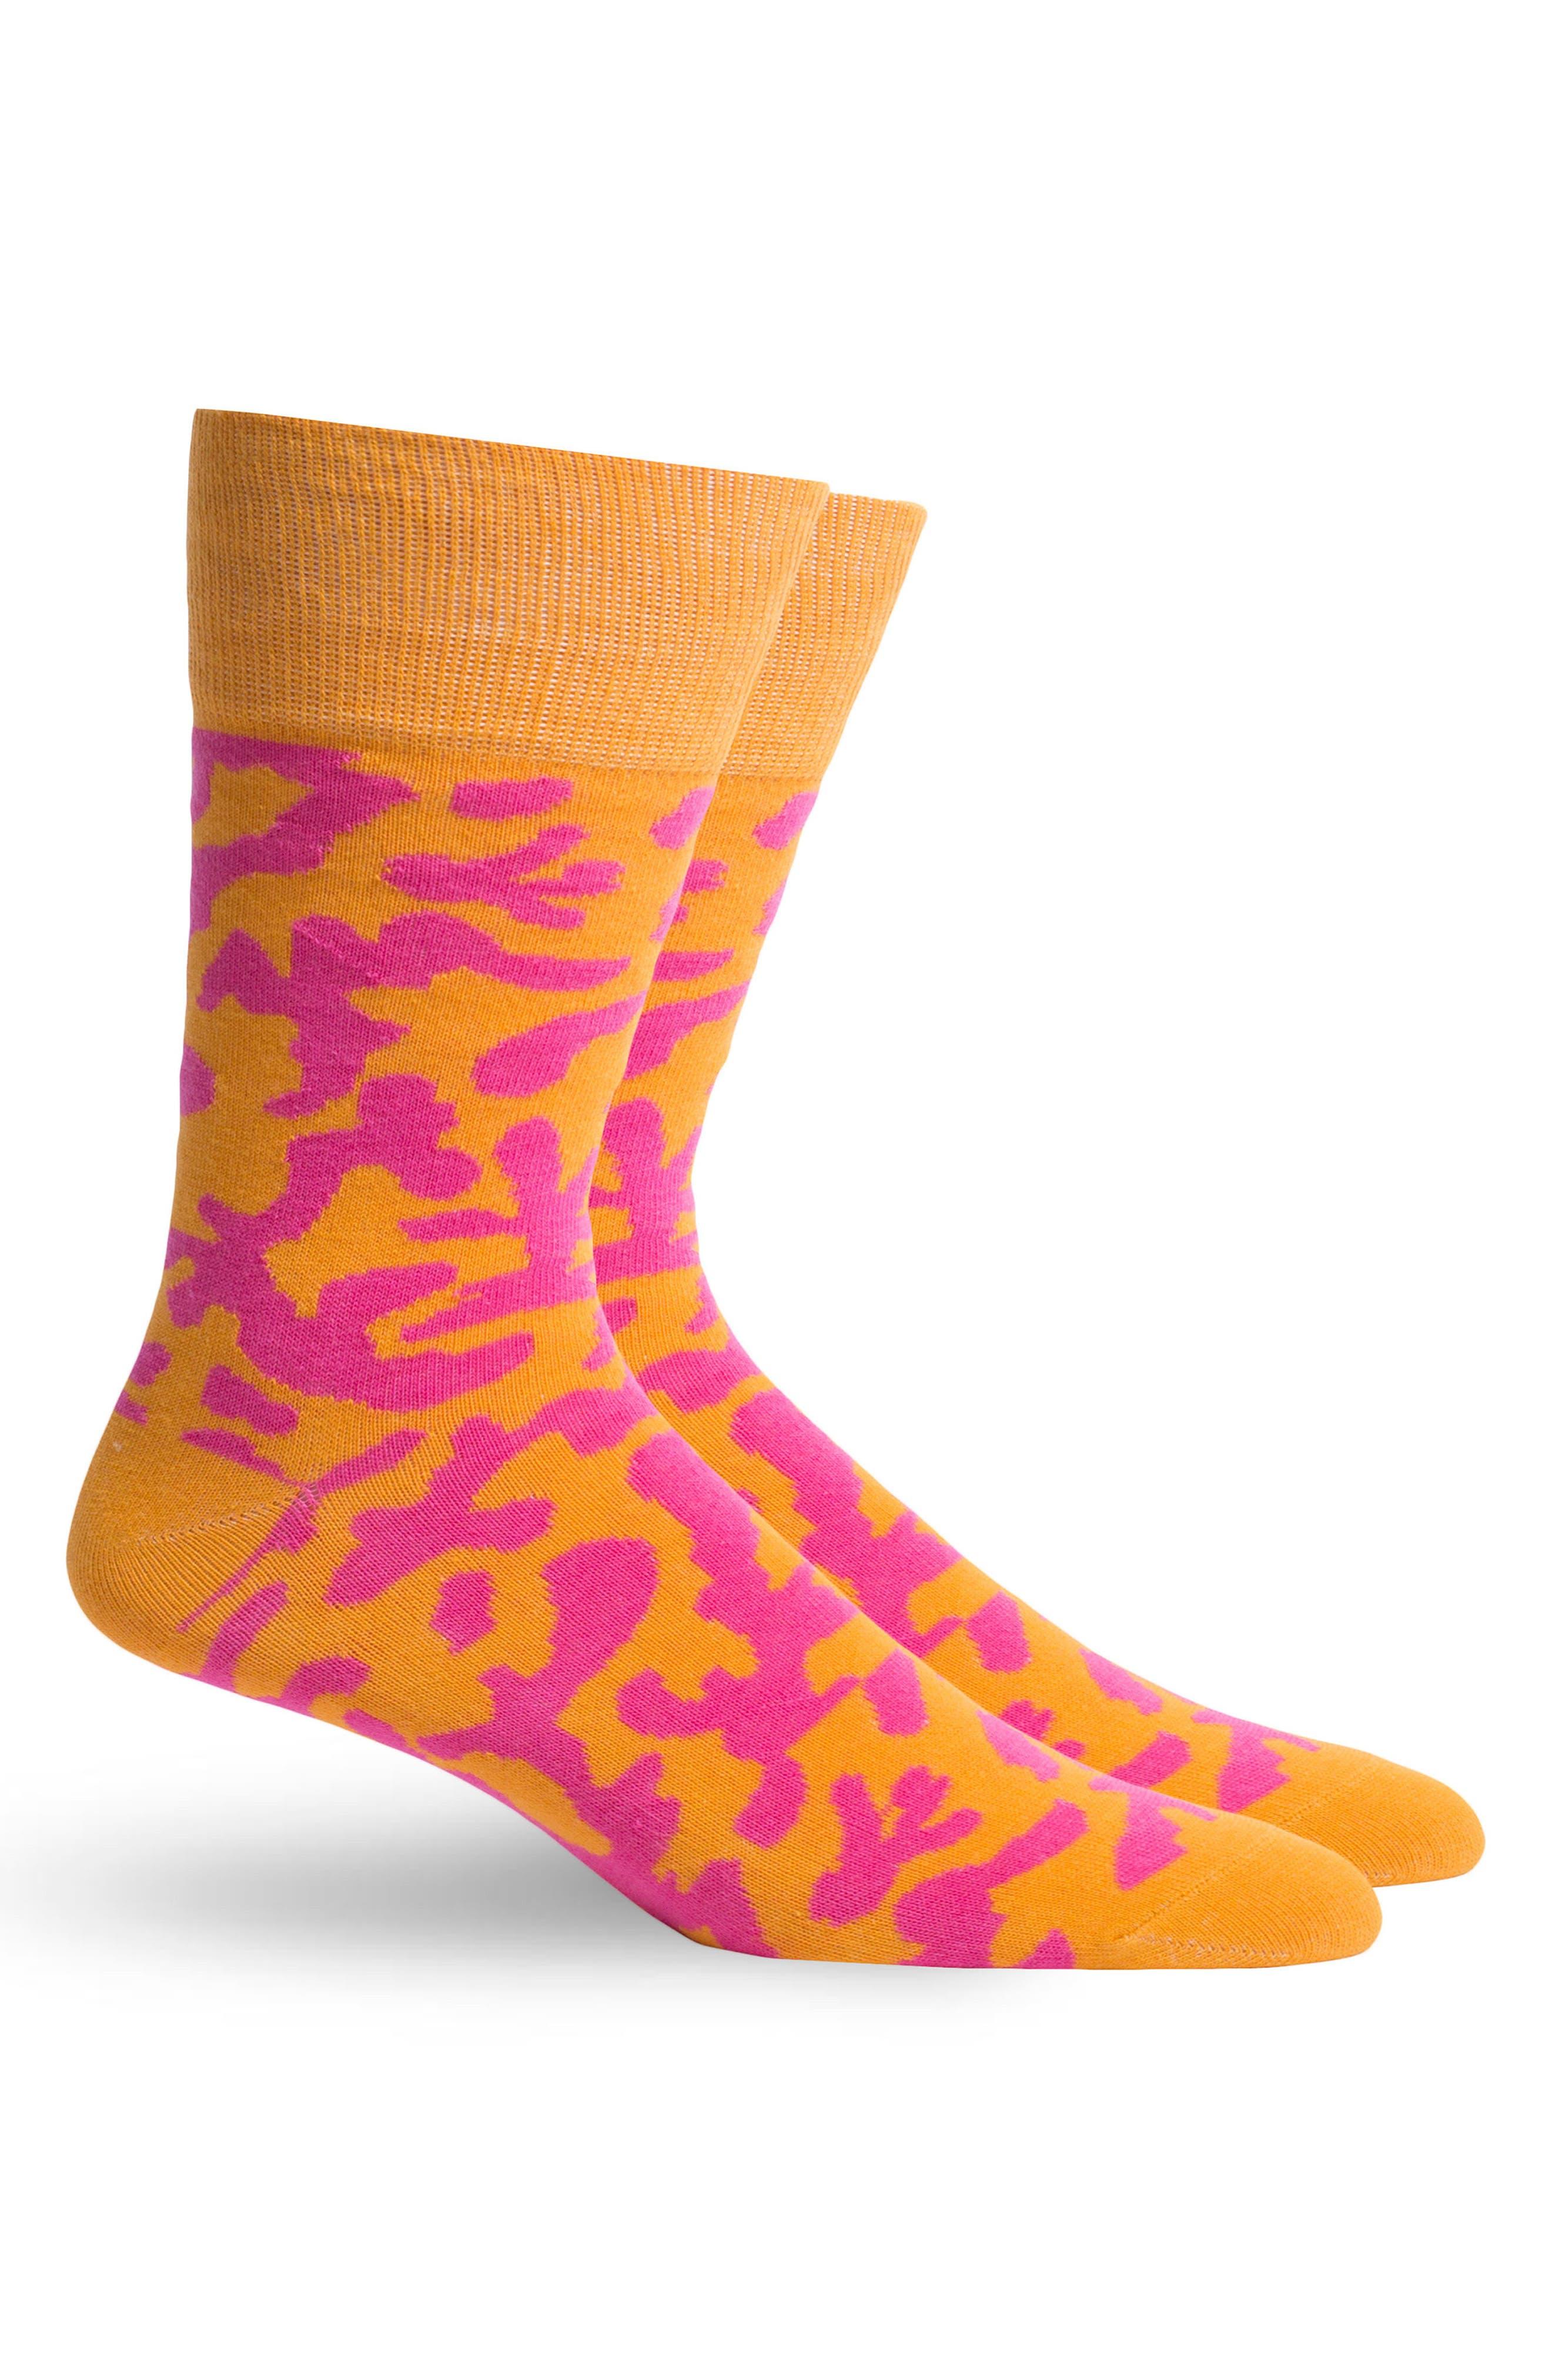 Coral Will Bryant Crew Socks,                             Alternate thumbnail 2, color,                             820